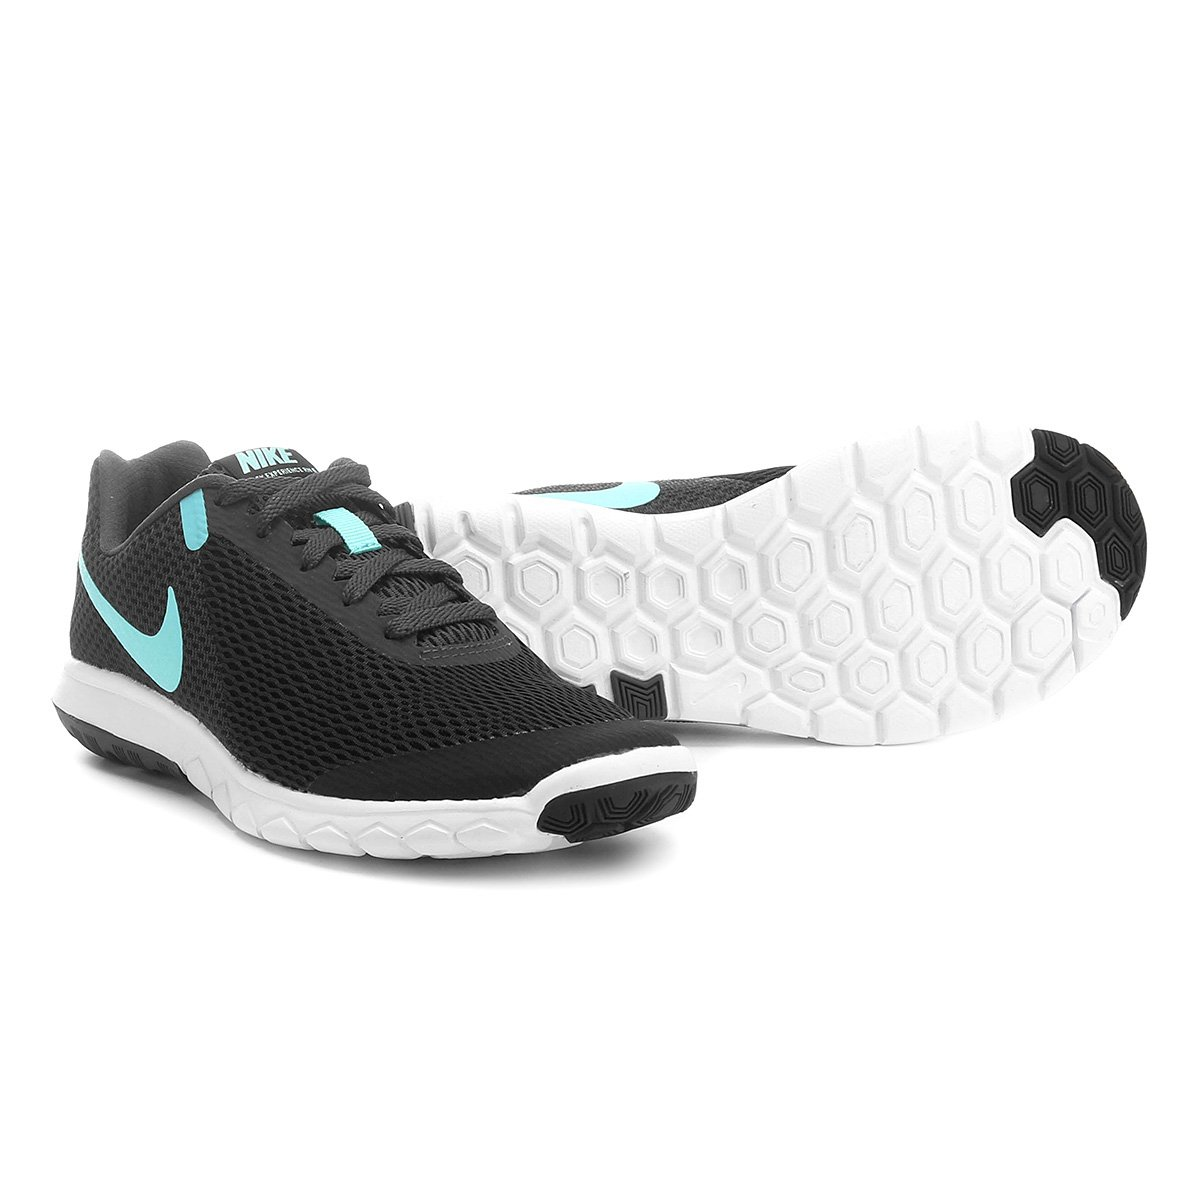 Tênis Nike Flex Experience Rn 6 Feminino - Preto e Azul claro ... cf155db15582c